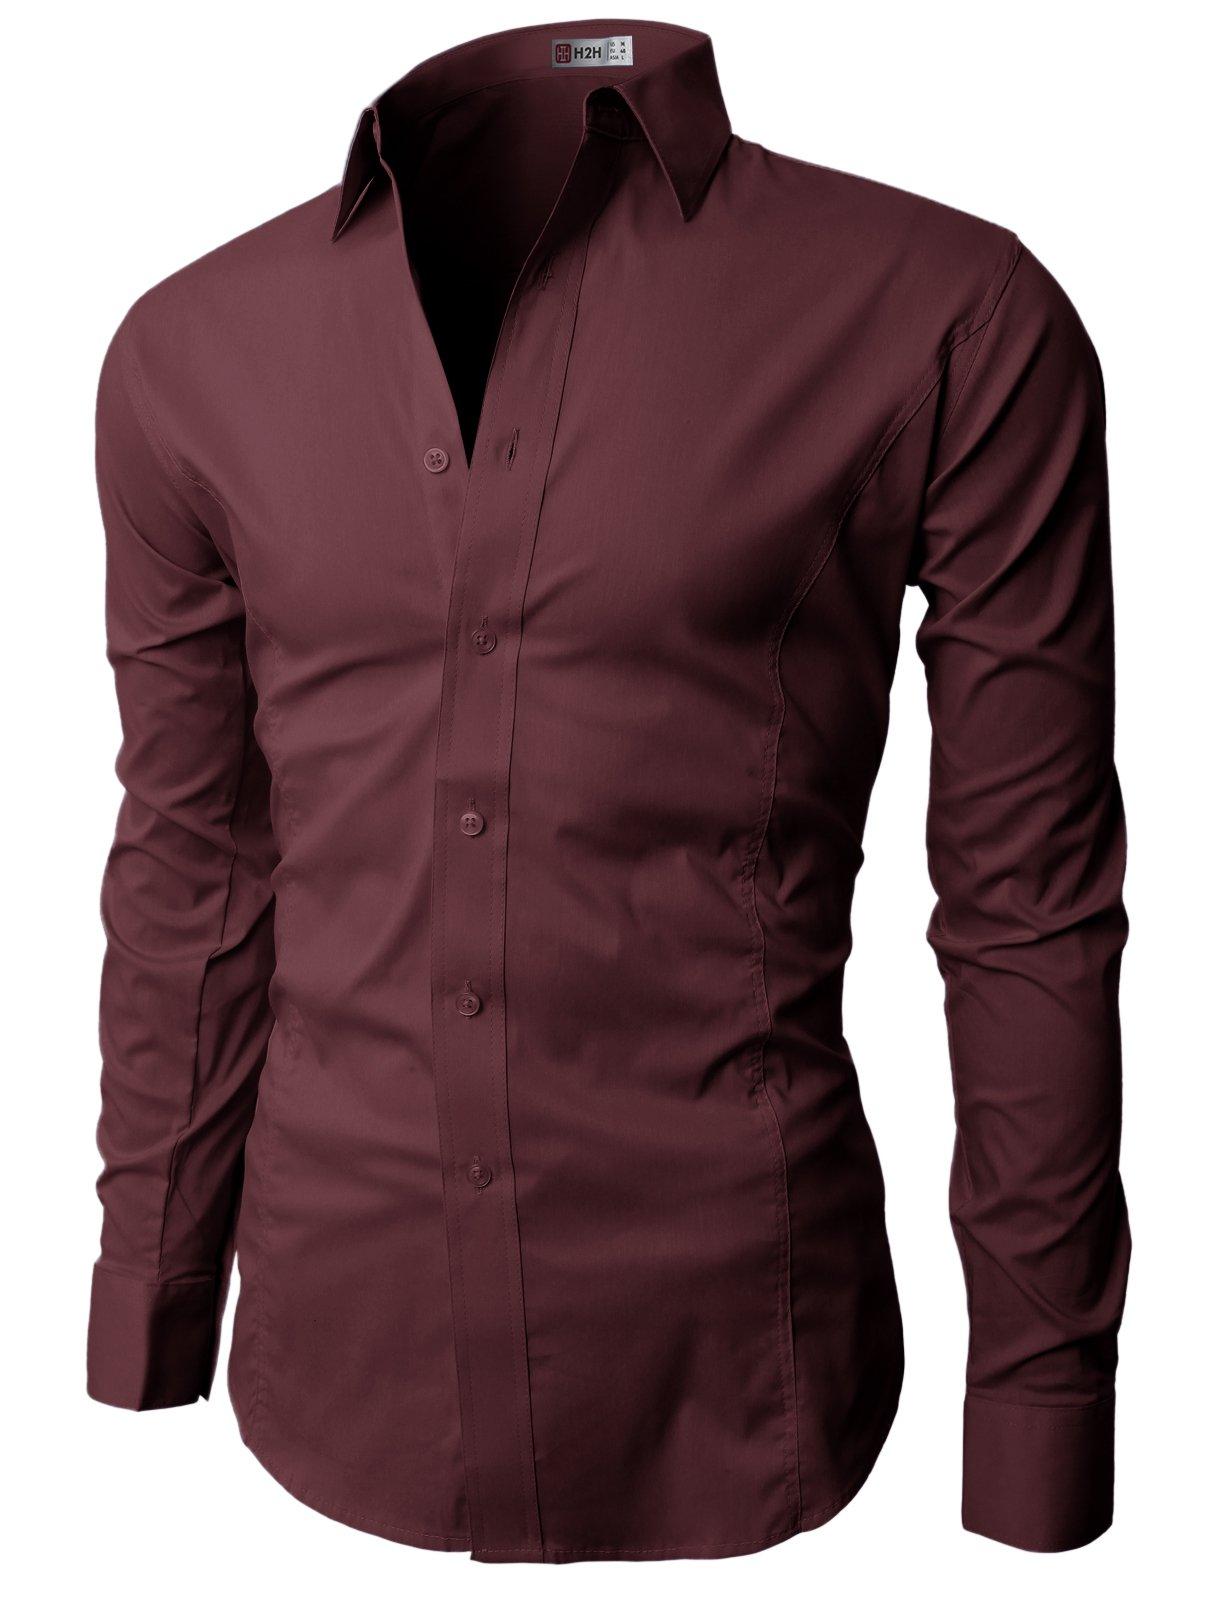 H2H Mens Regular Fit Long Sleeve Button-End Closure Dress Shirts WINE M (JASK14)